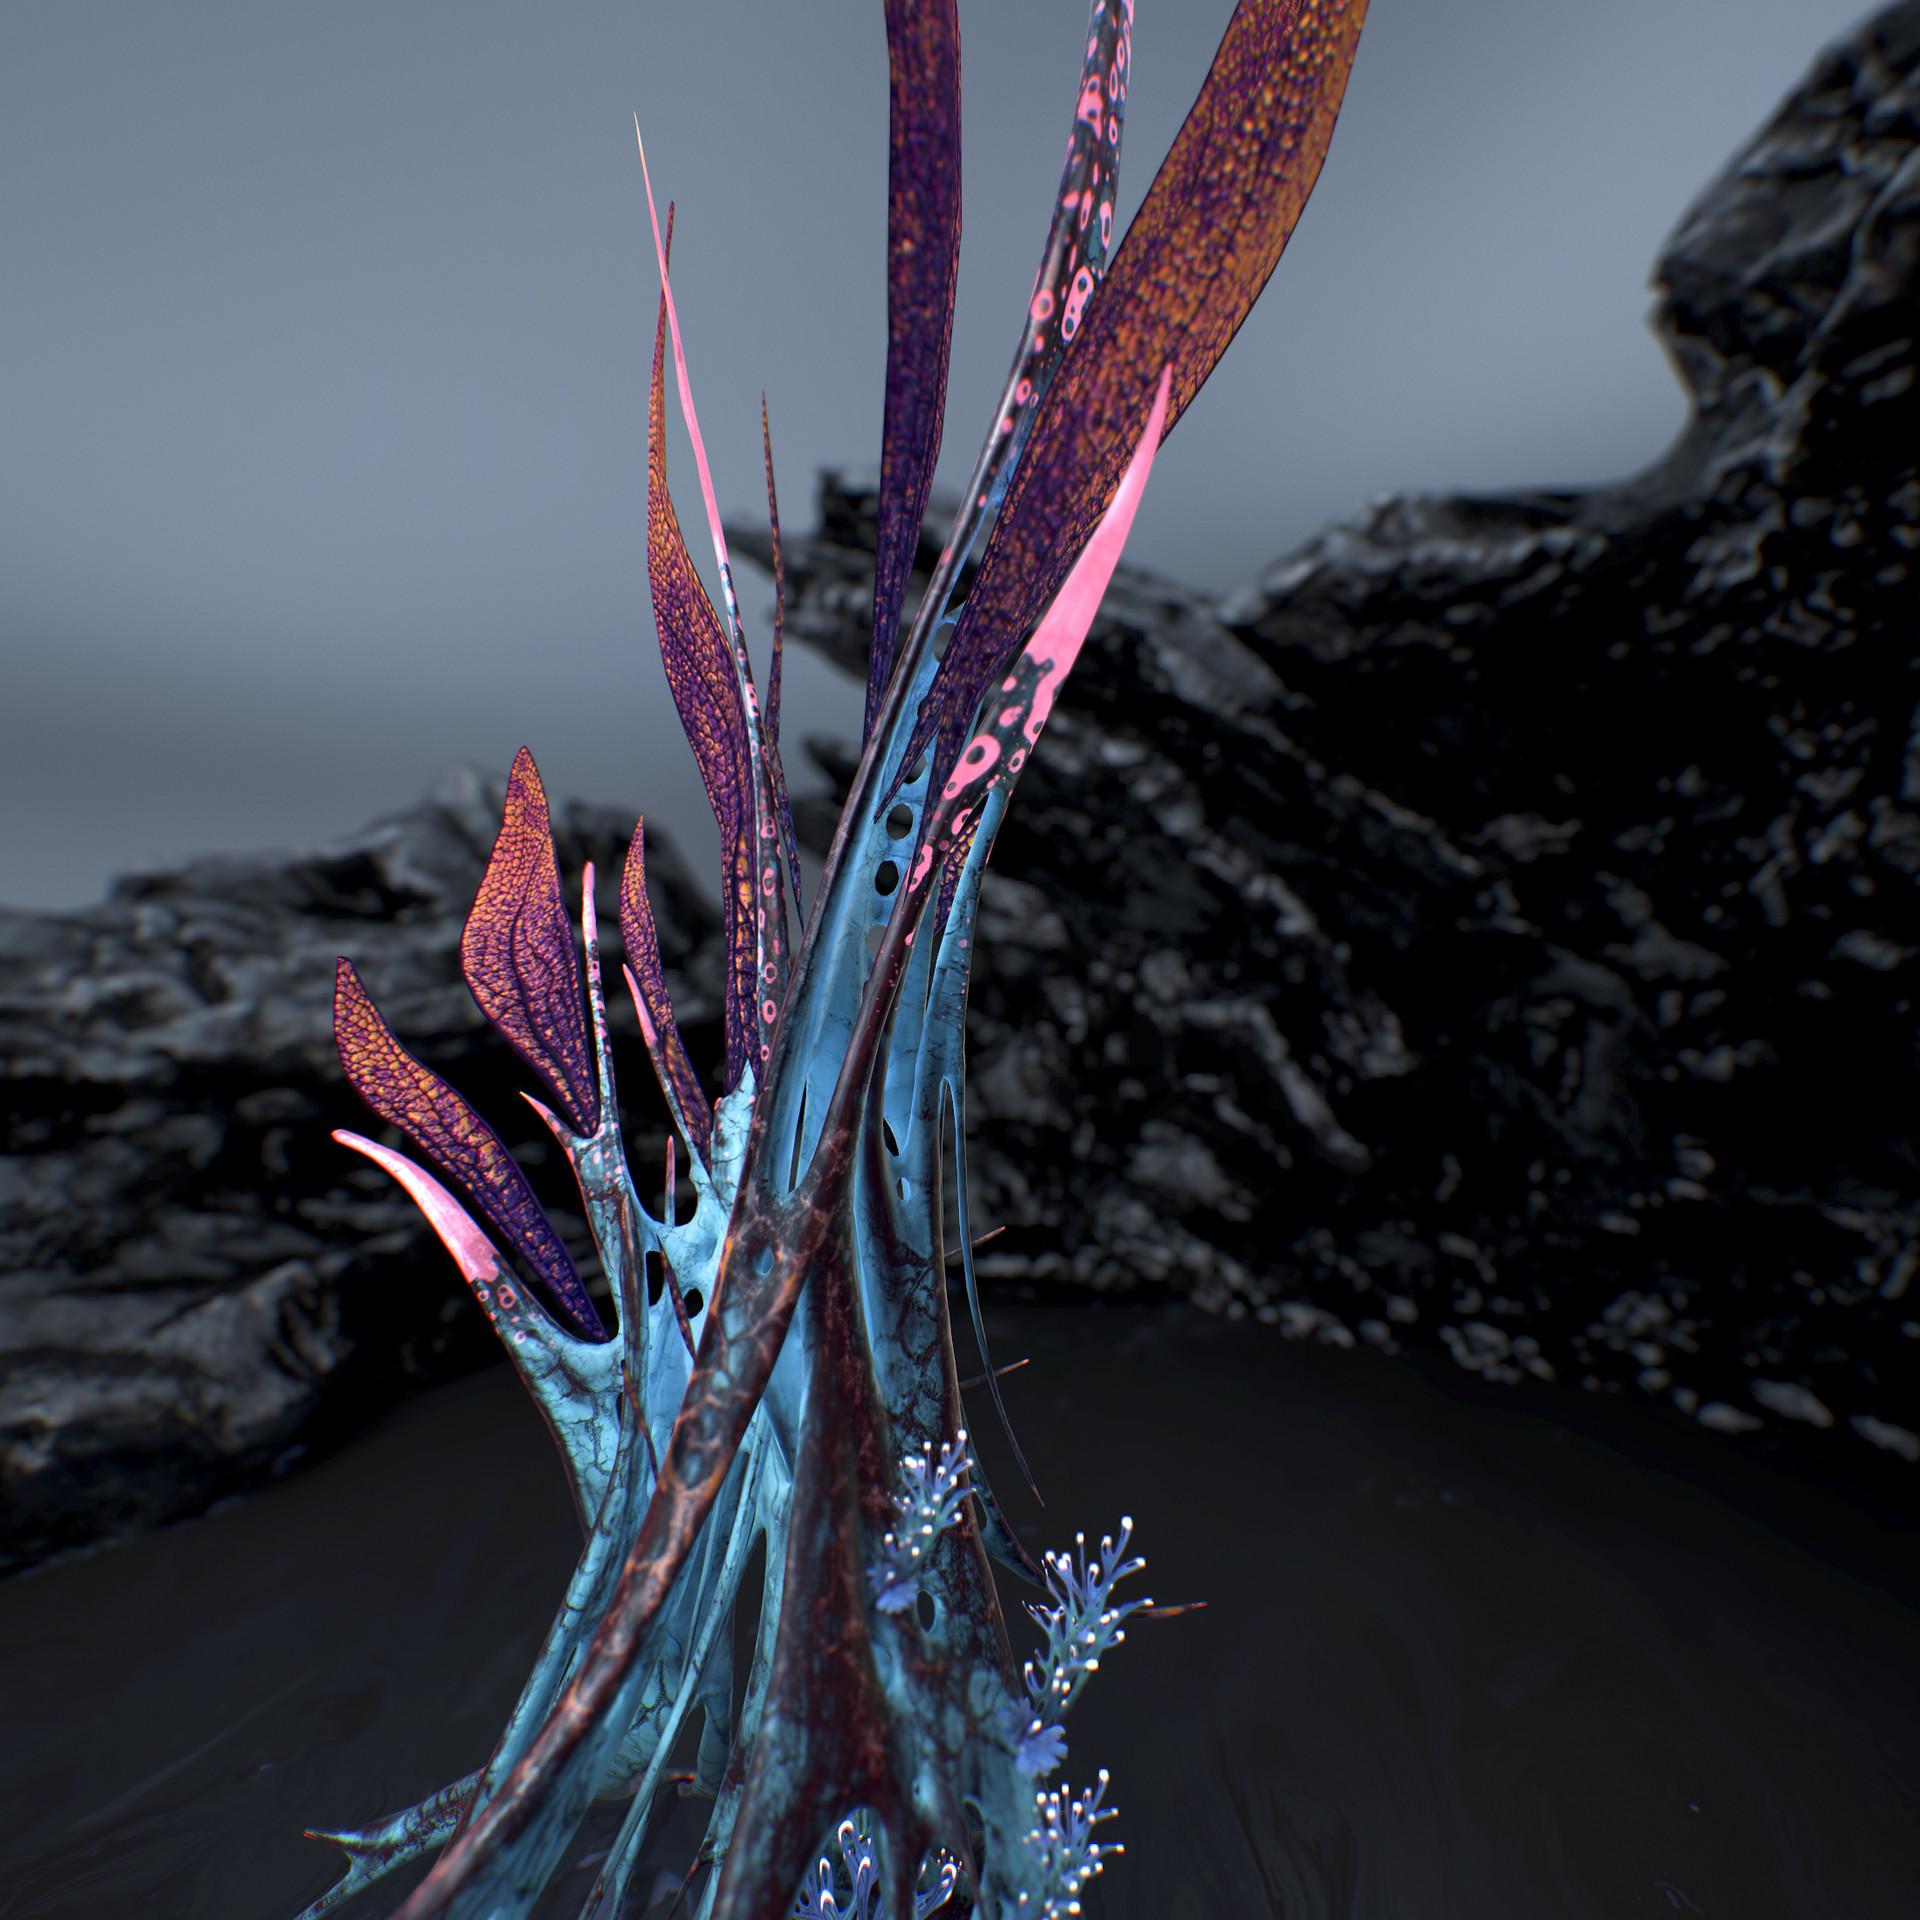 Johan de leenheer alien fern misota spletinus10